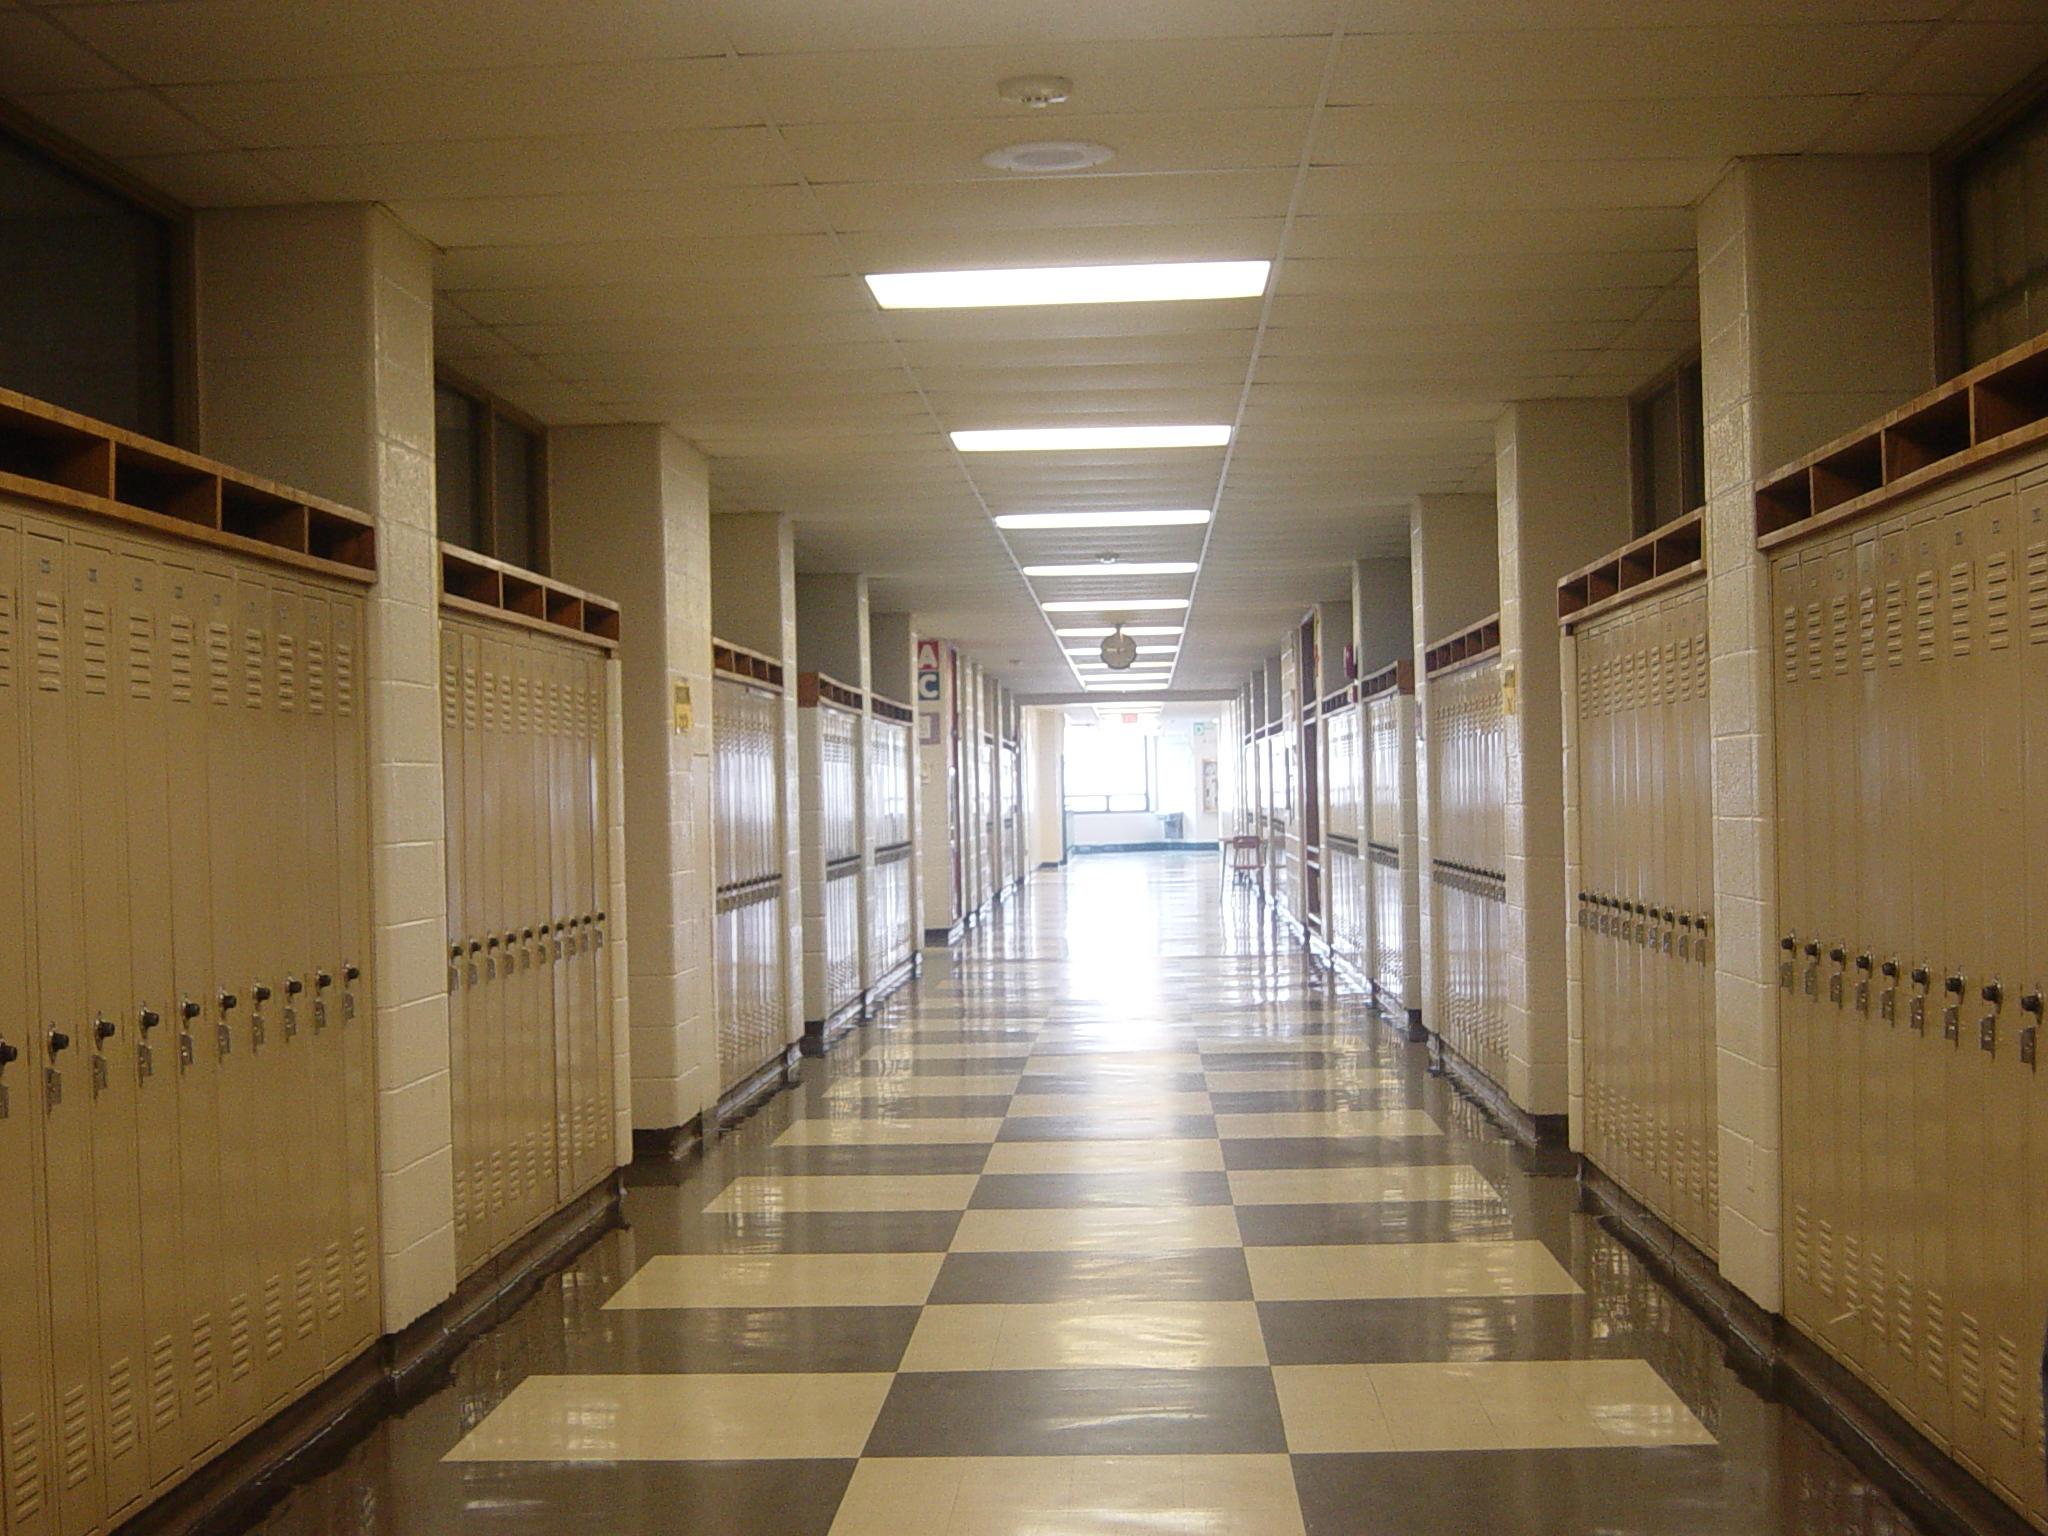 school hallway background - photo #16